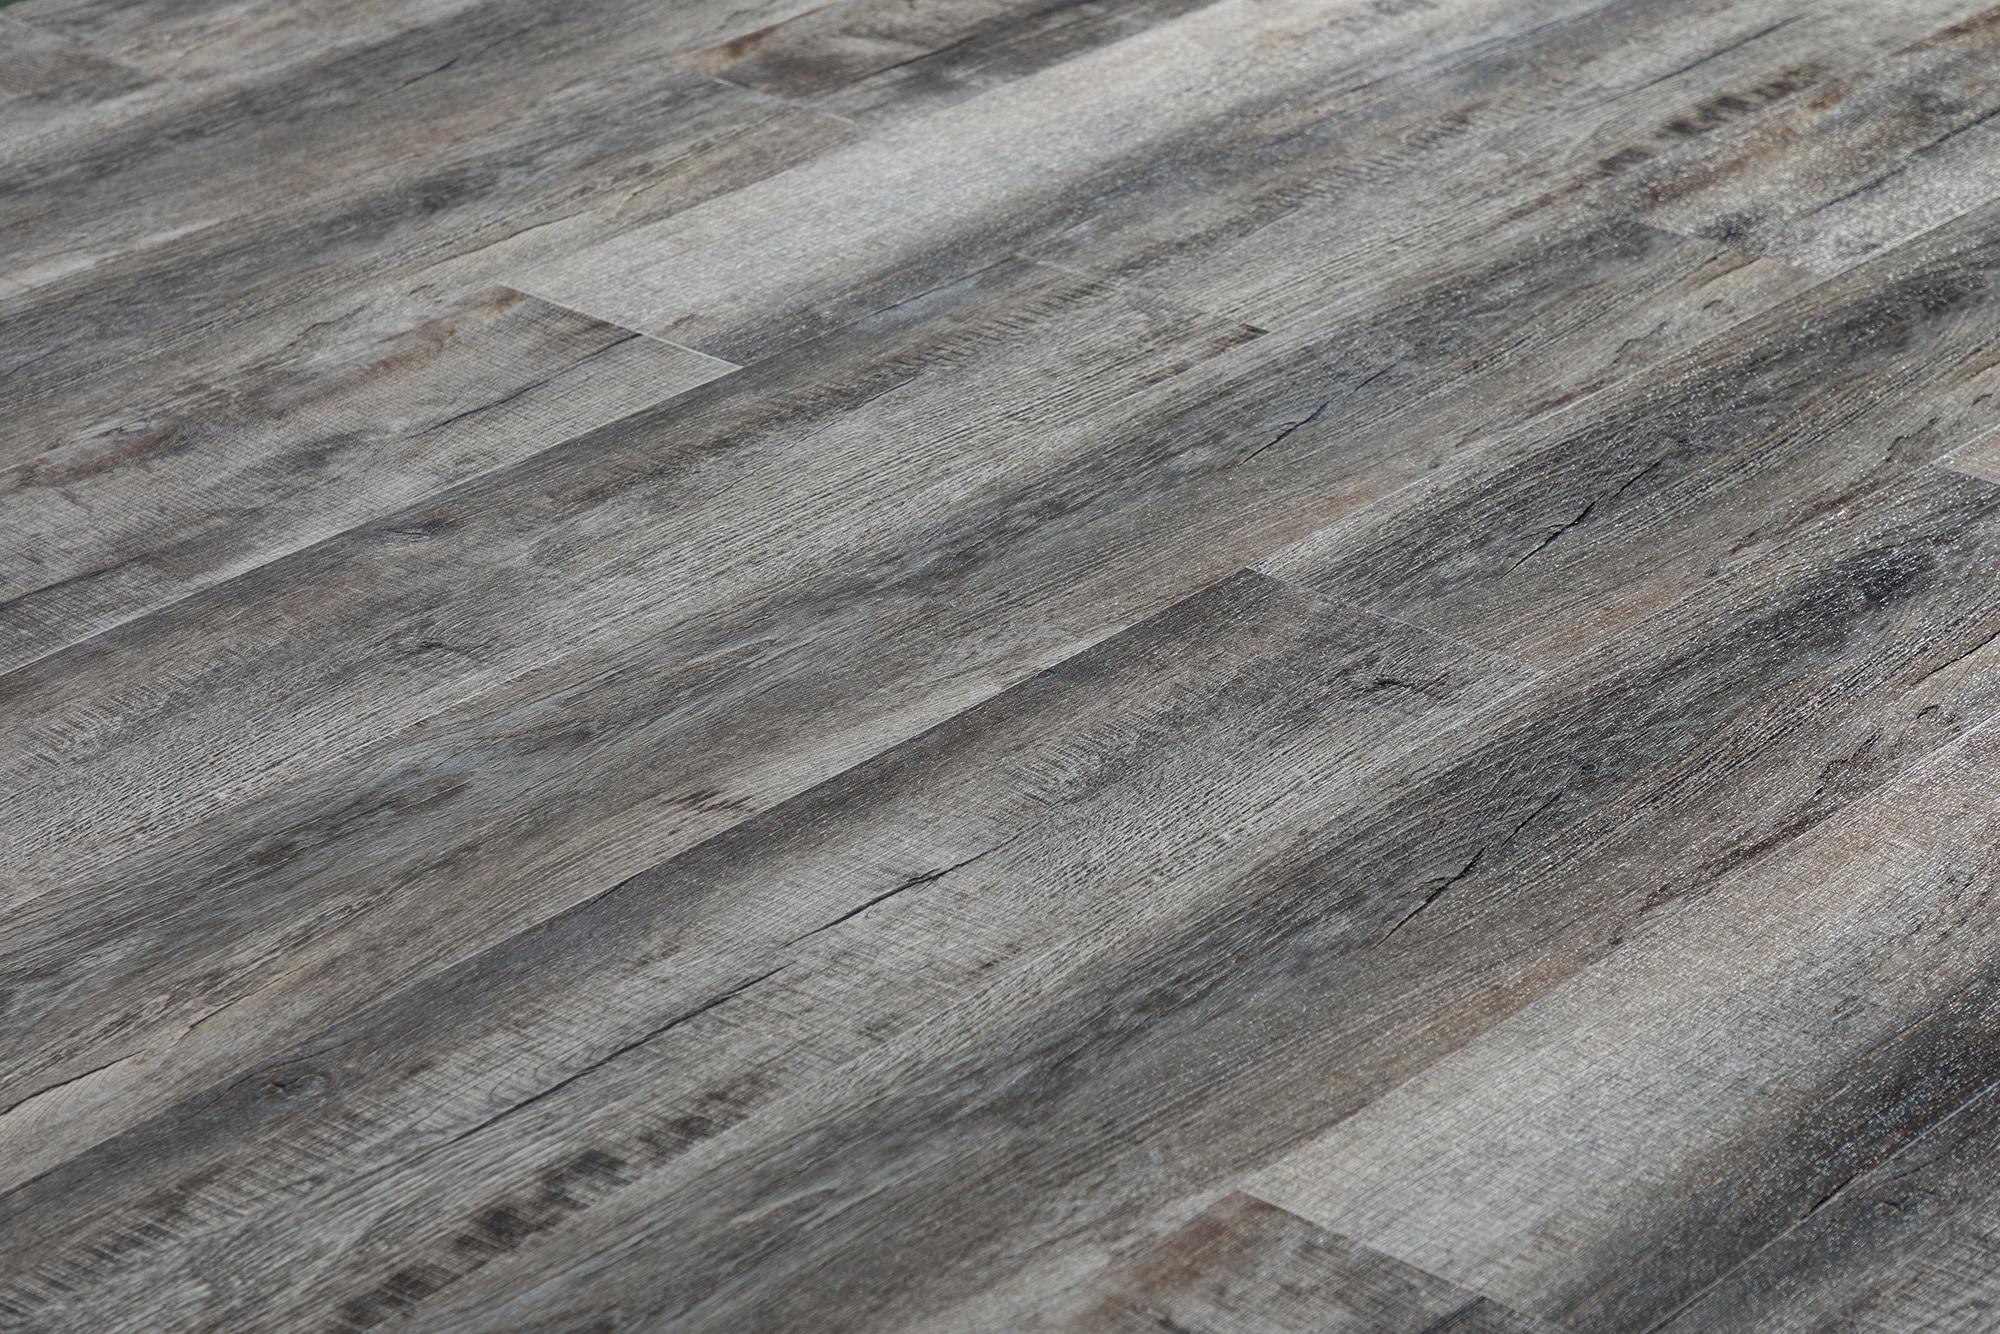 Grey Brushed French Oak / 6.5mm / SPC / Click Lock Vinyl Planks - 6.5mm SPC Click Lock - XL Jumbo Collection 0